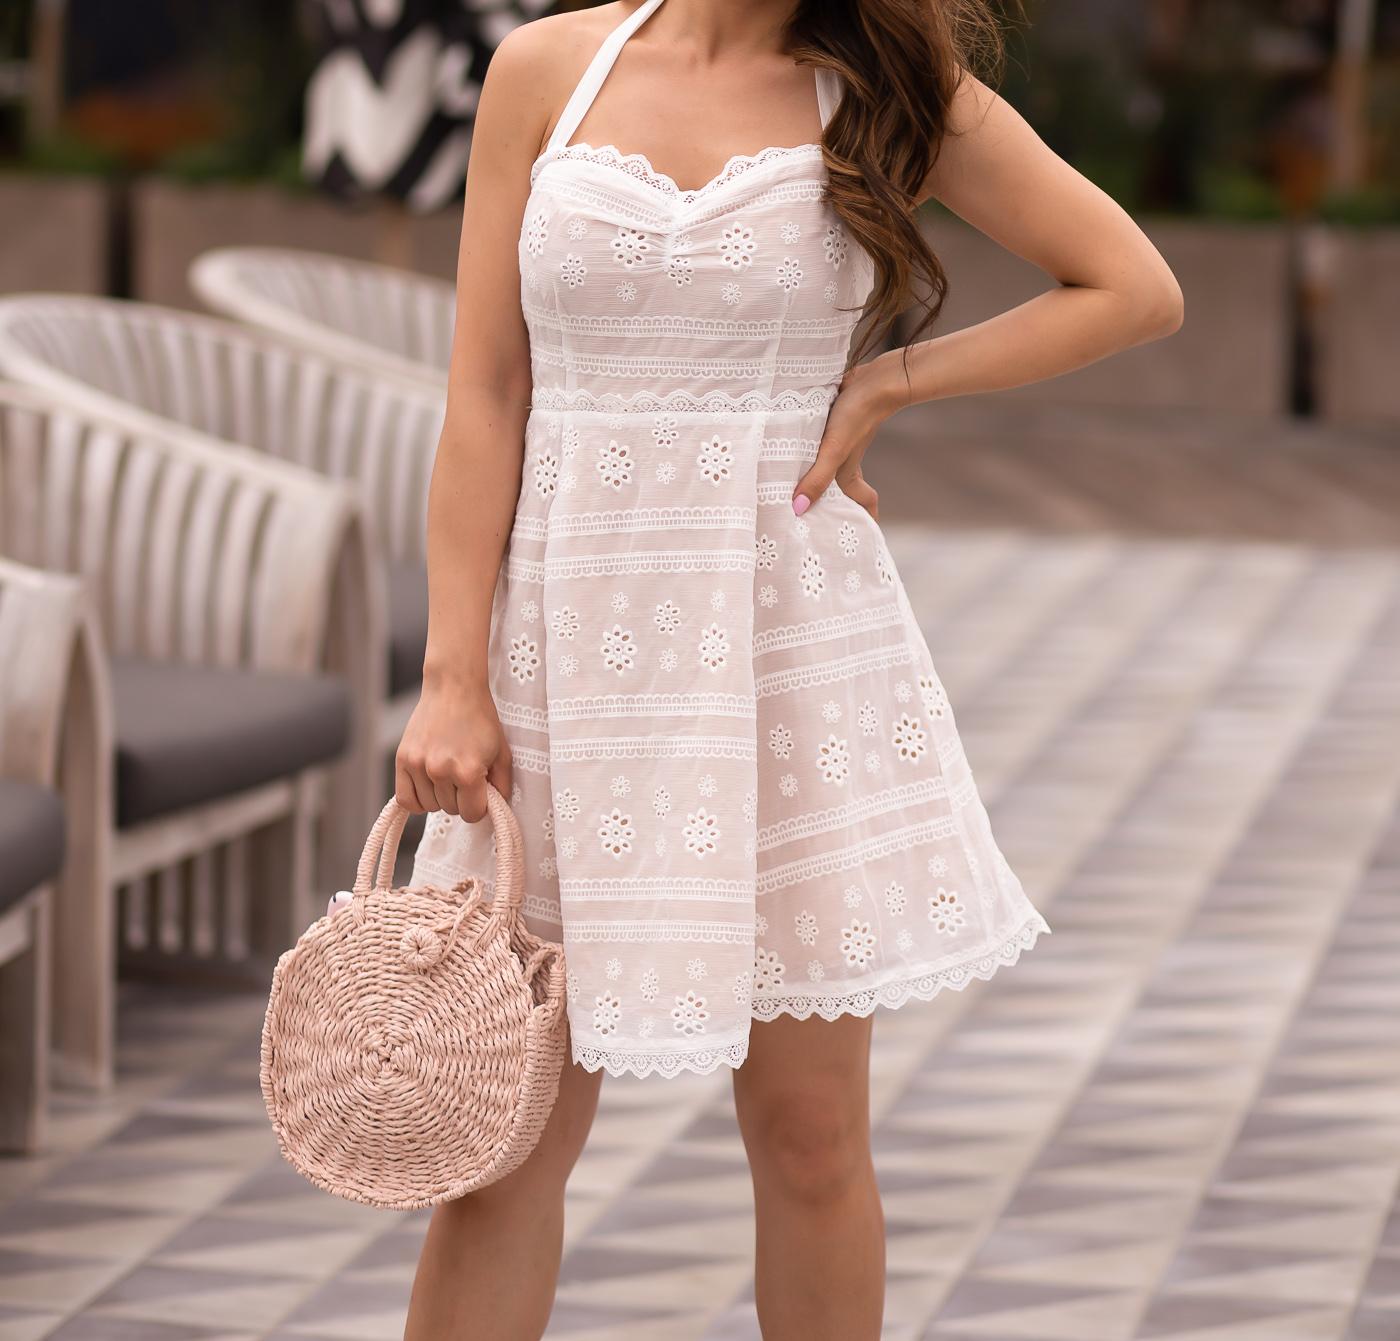 summer outfit white crochet halter dress blush espadrilles pink straw bag